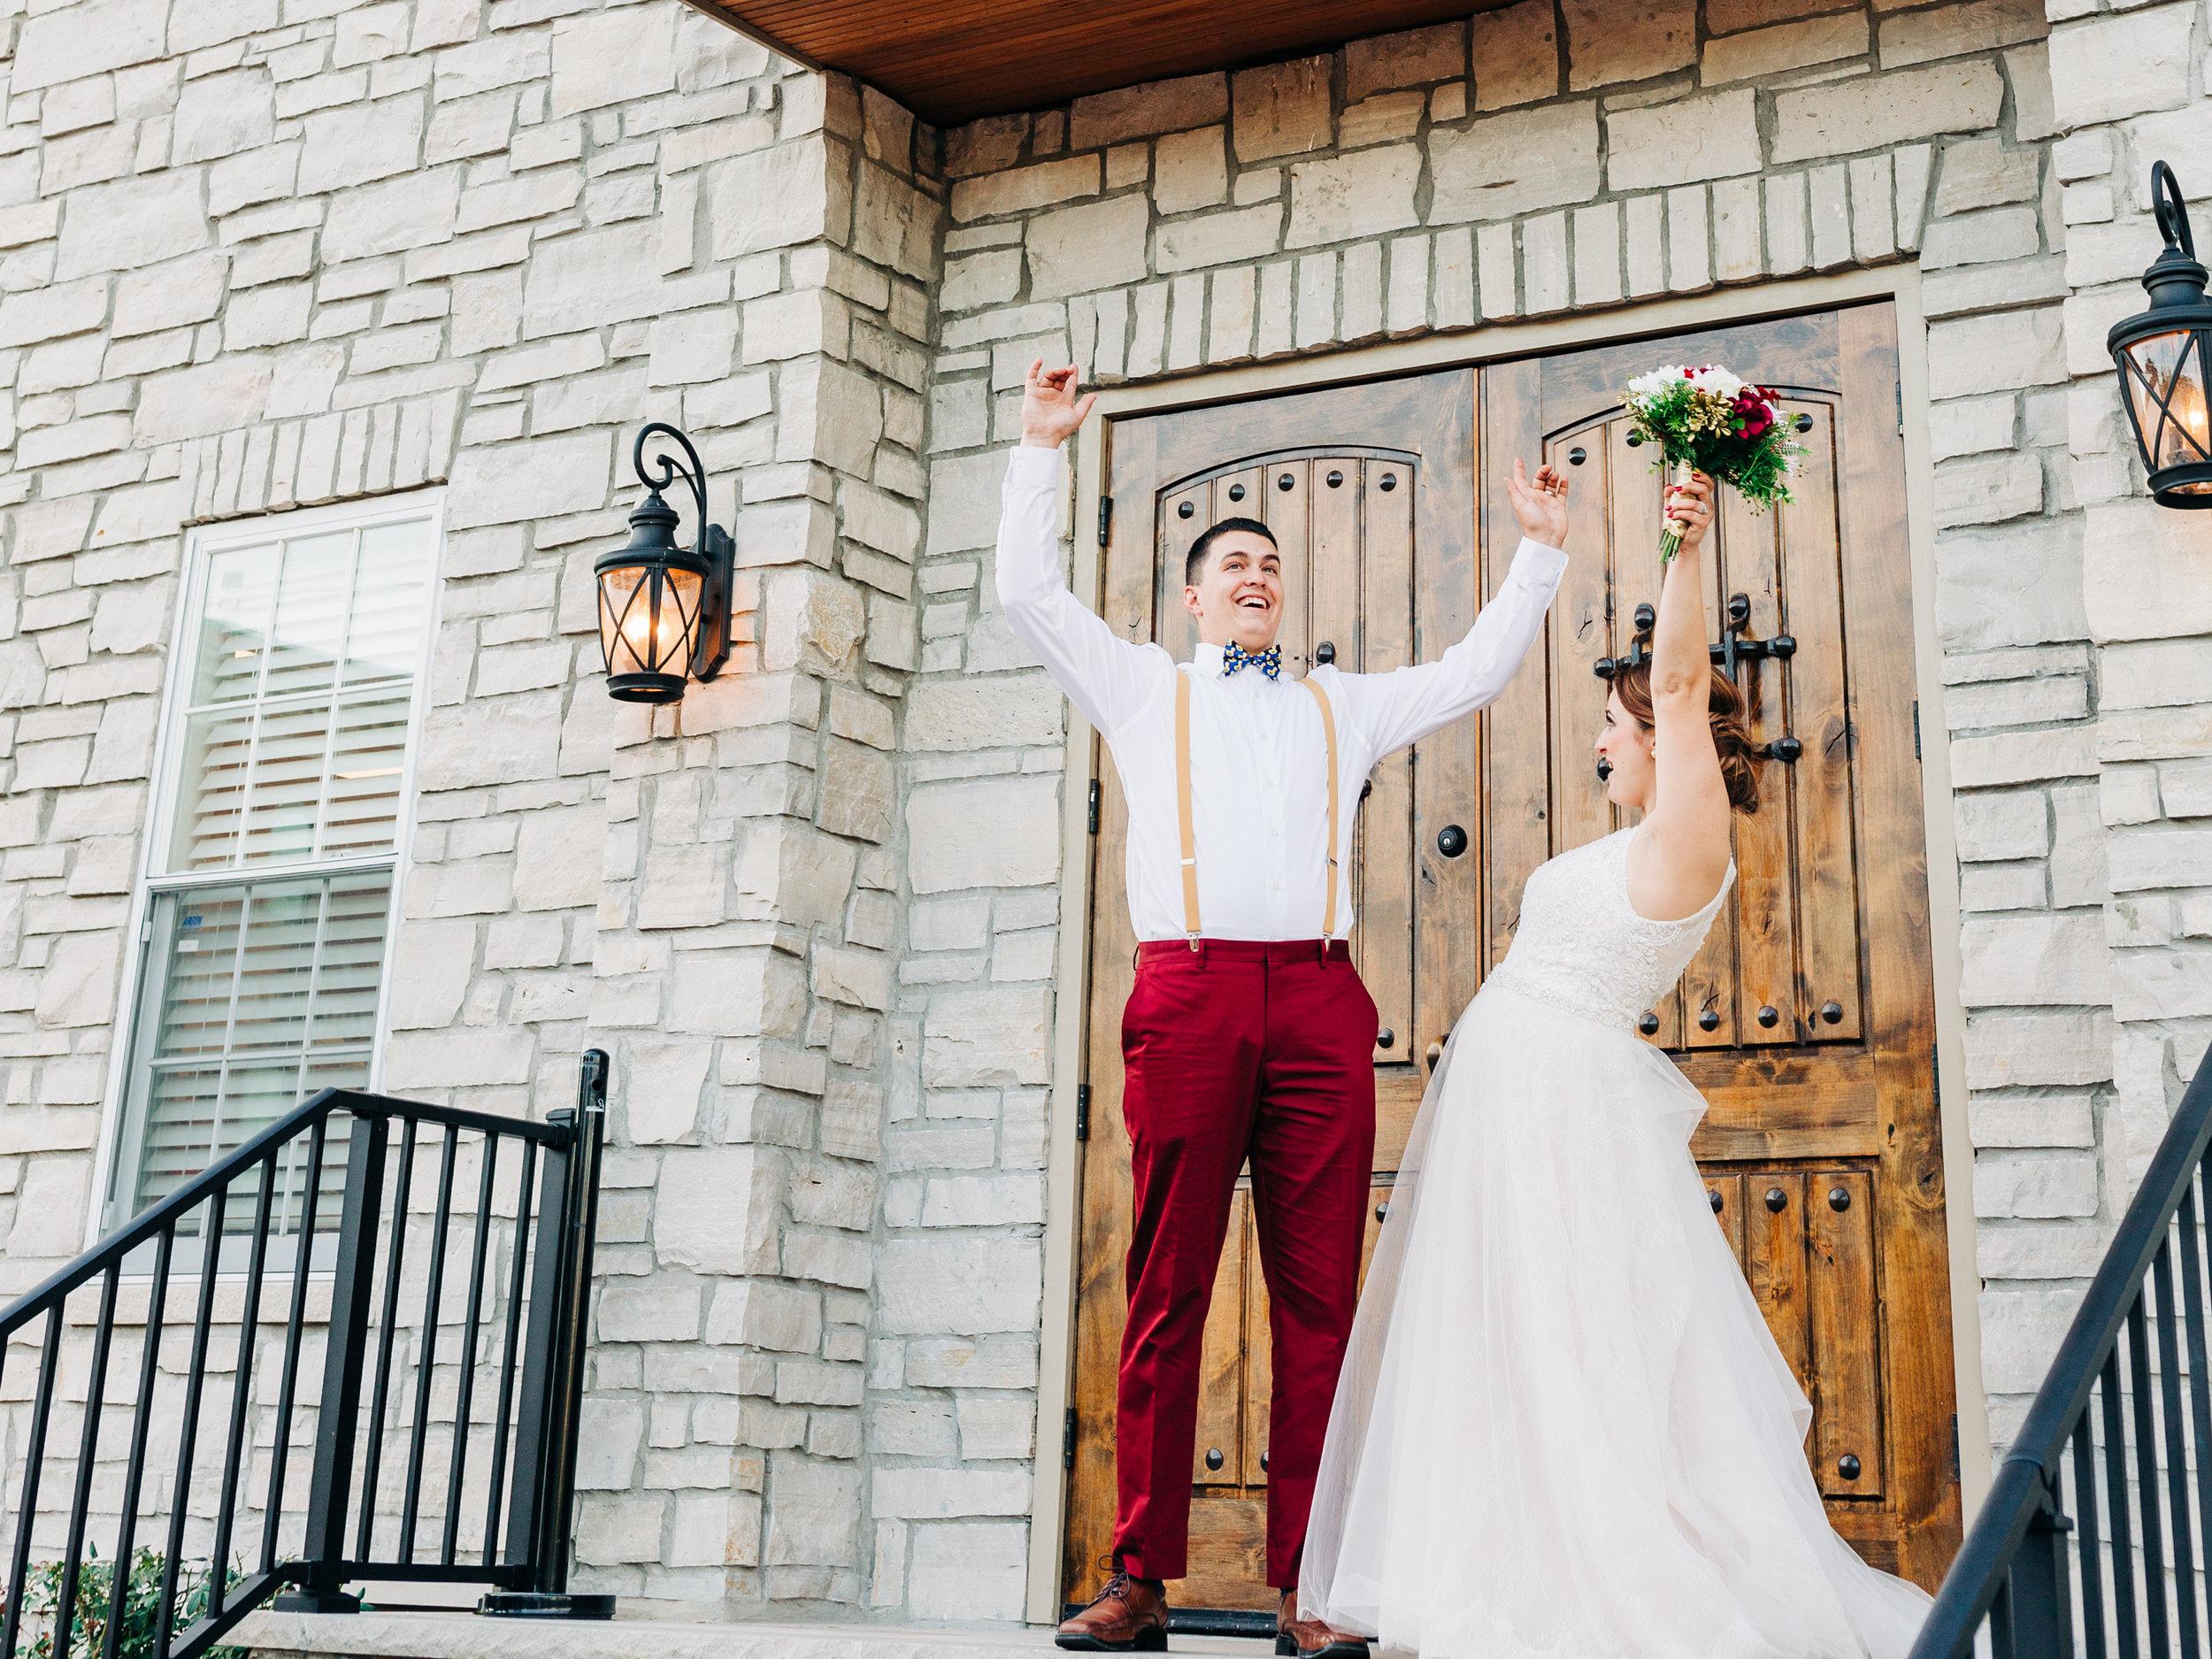 Dorothy_Louise_Photography_Eric_Fallon_La-Belle_Coeur_Main_Street_St_Charles_Wedding-1040.jpg